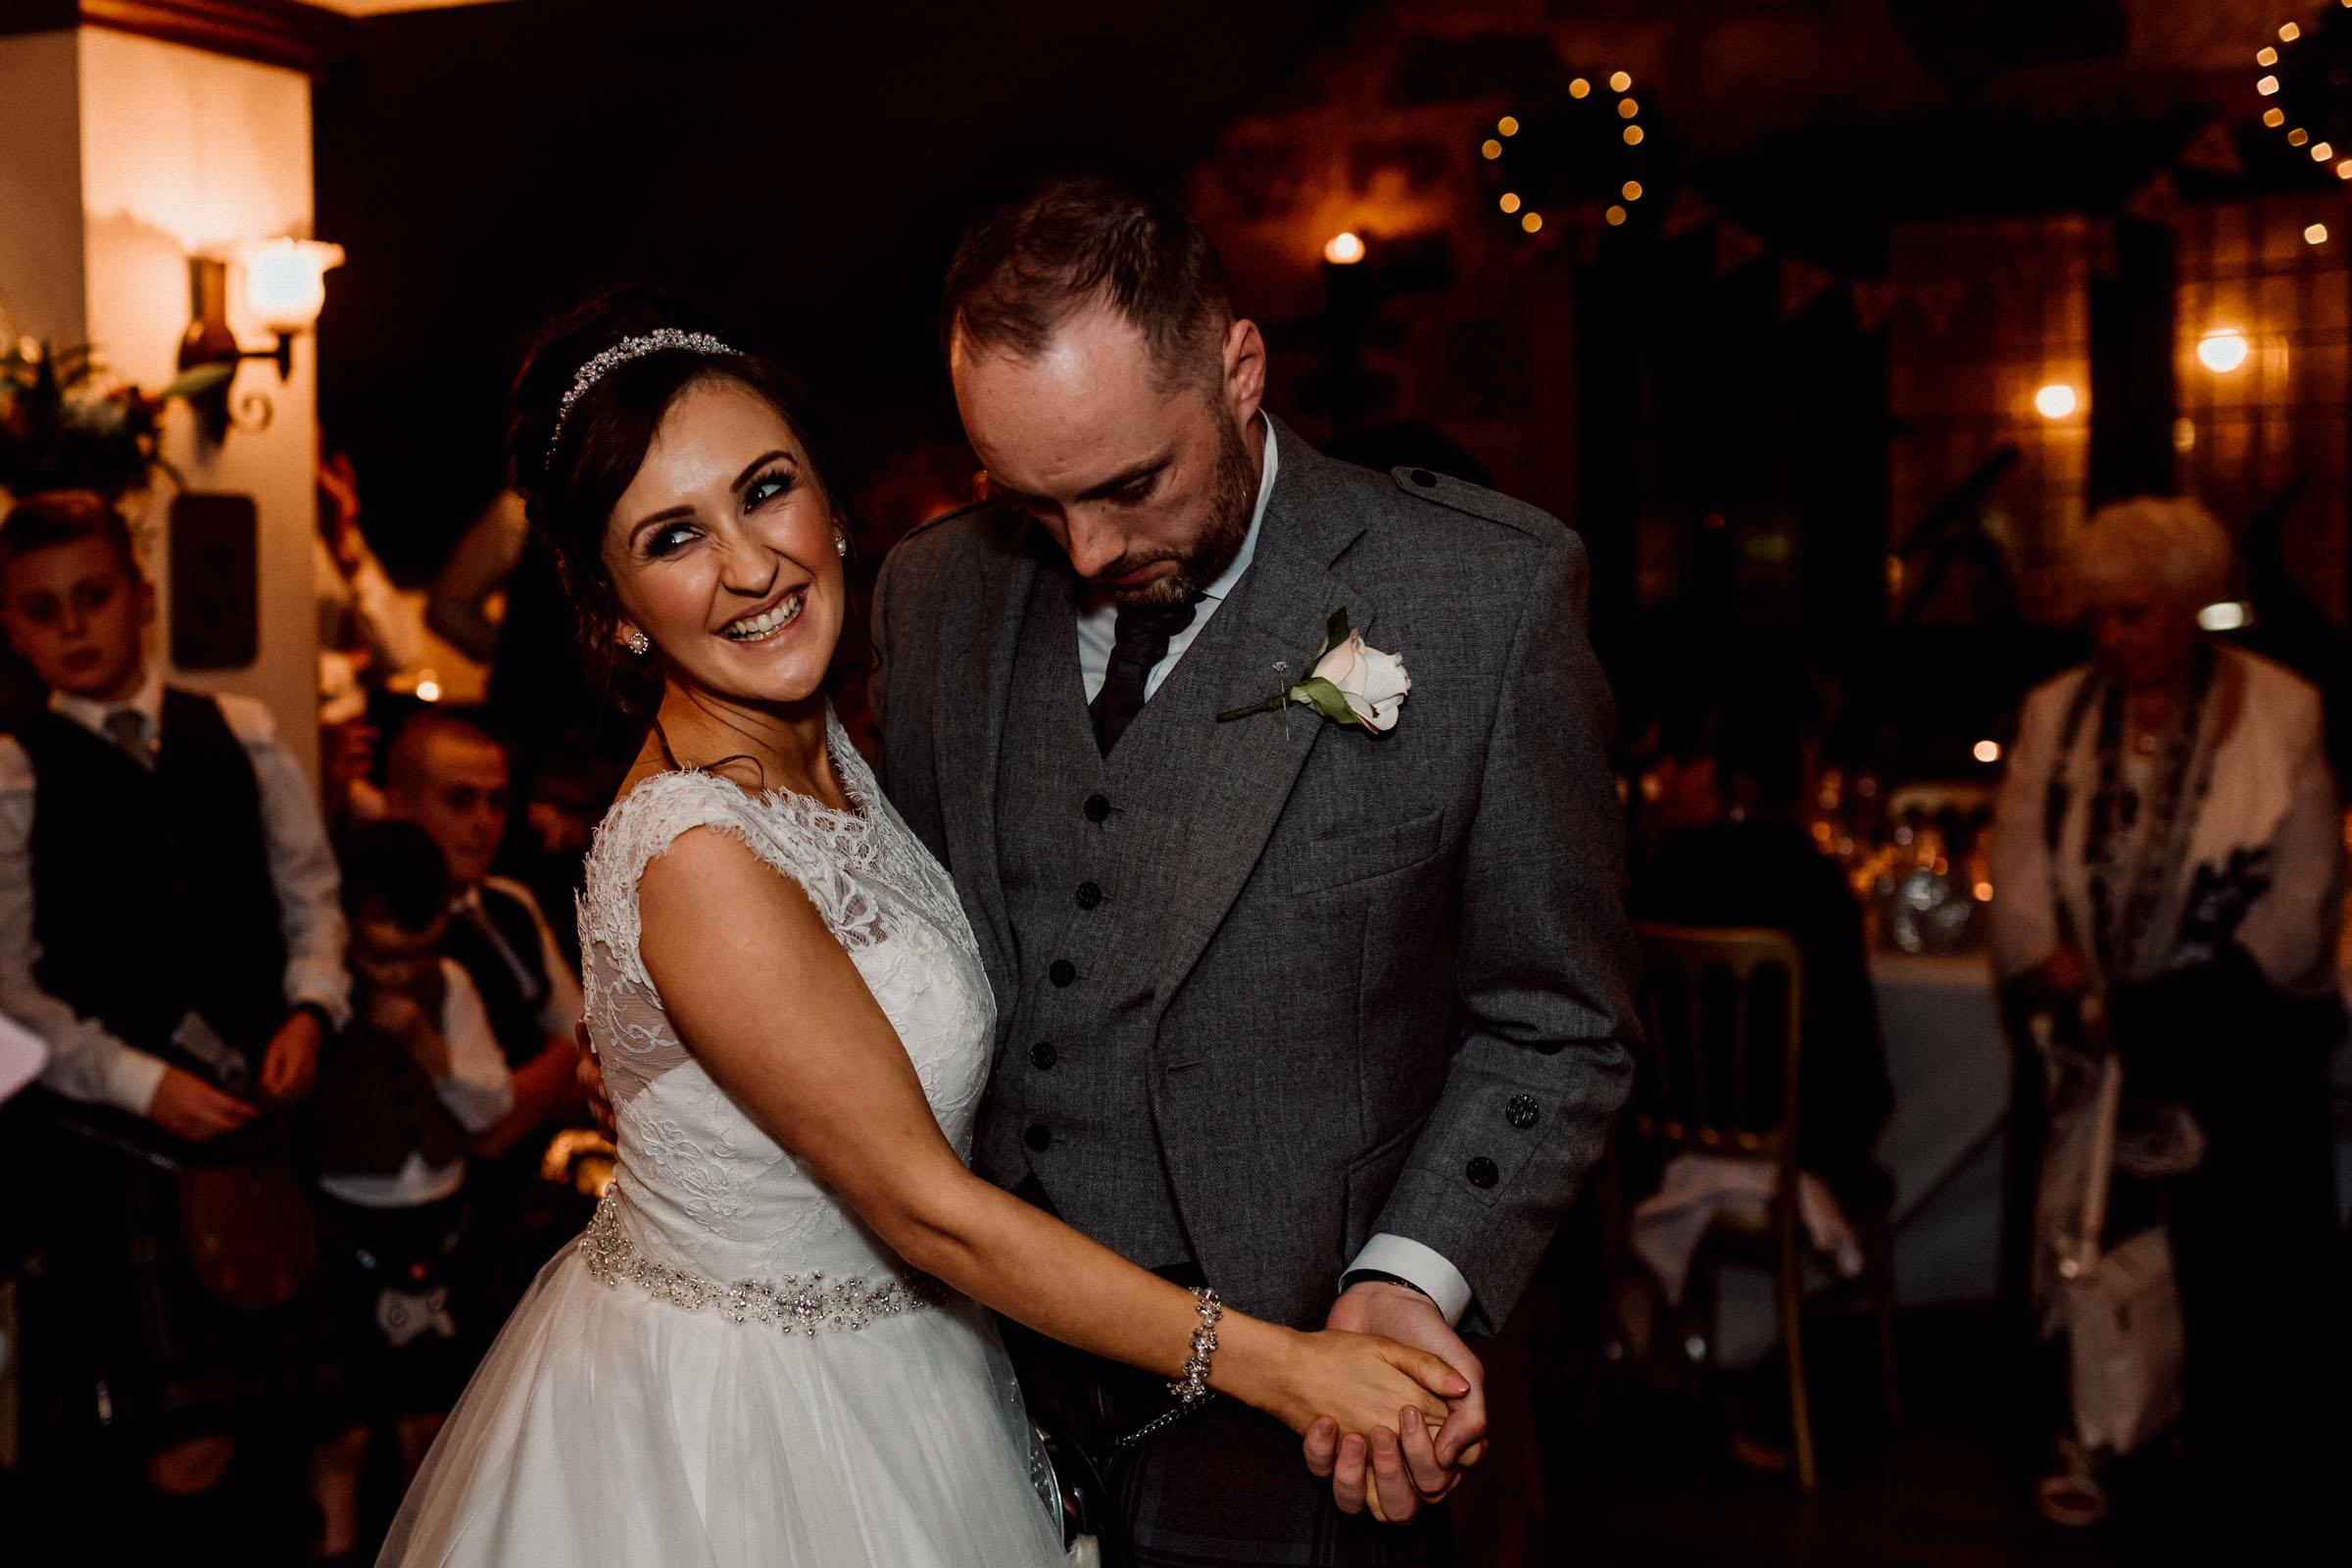 Oran-Mor-Wedding-Photographer-DearlyPhotography (51 of 55).jpg